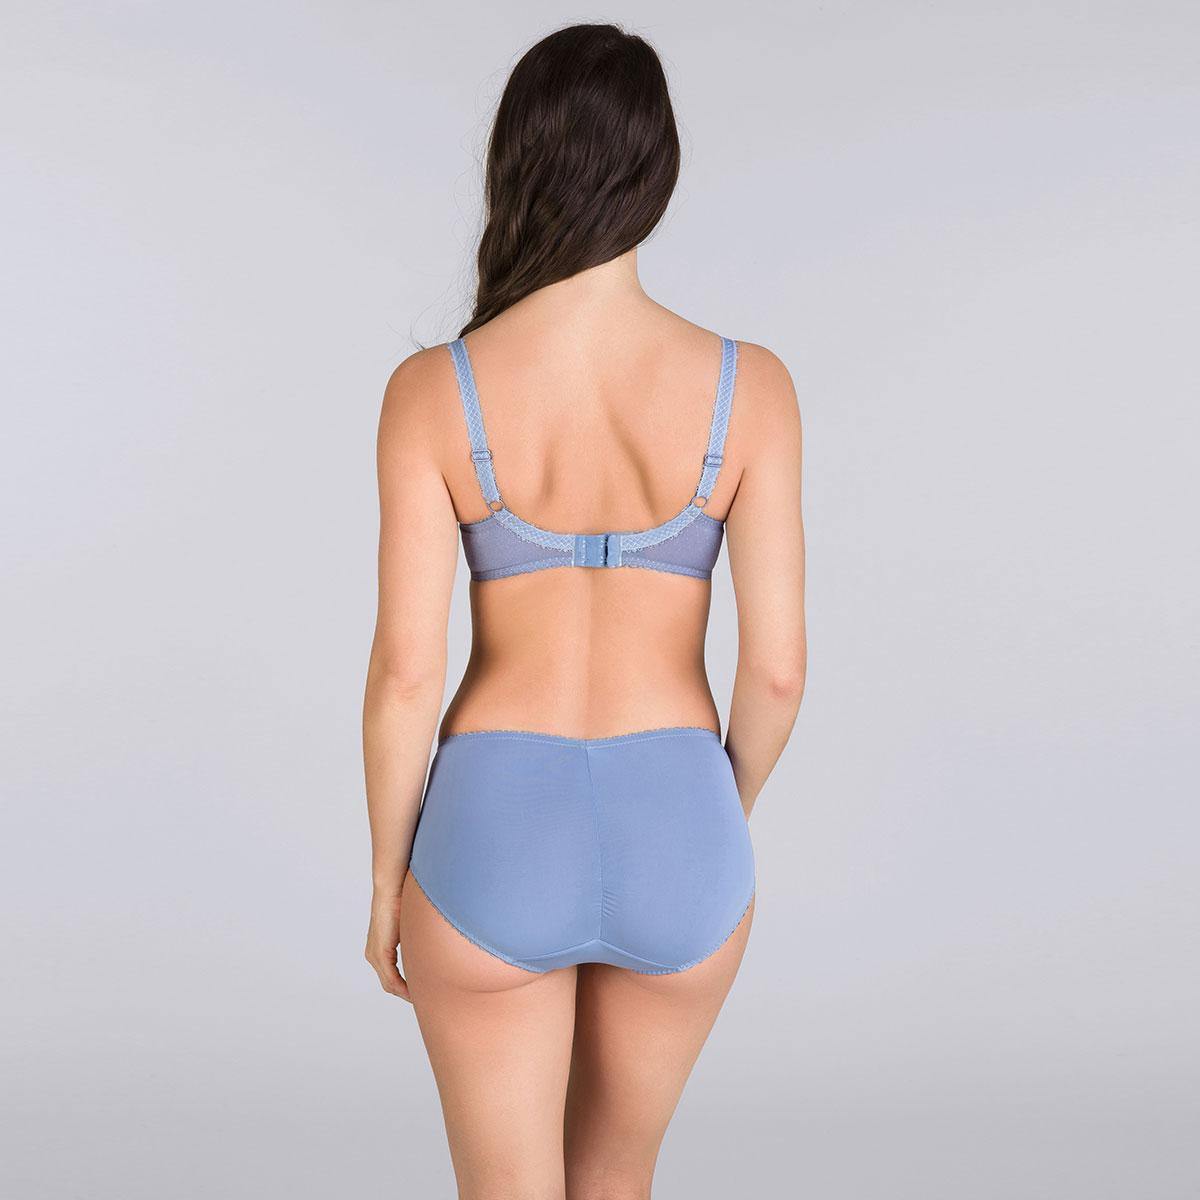 Culotte Midi bleu jean - Cœur Croisé Dentelle-PLAYTEX